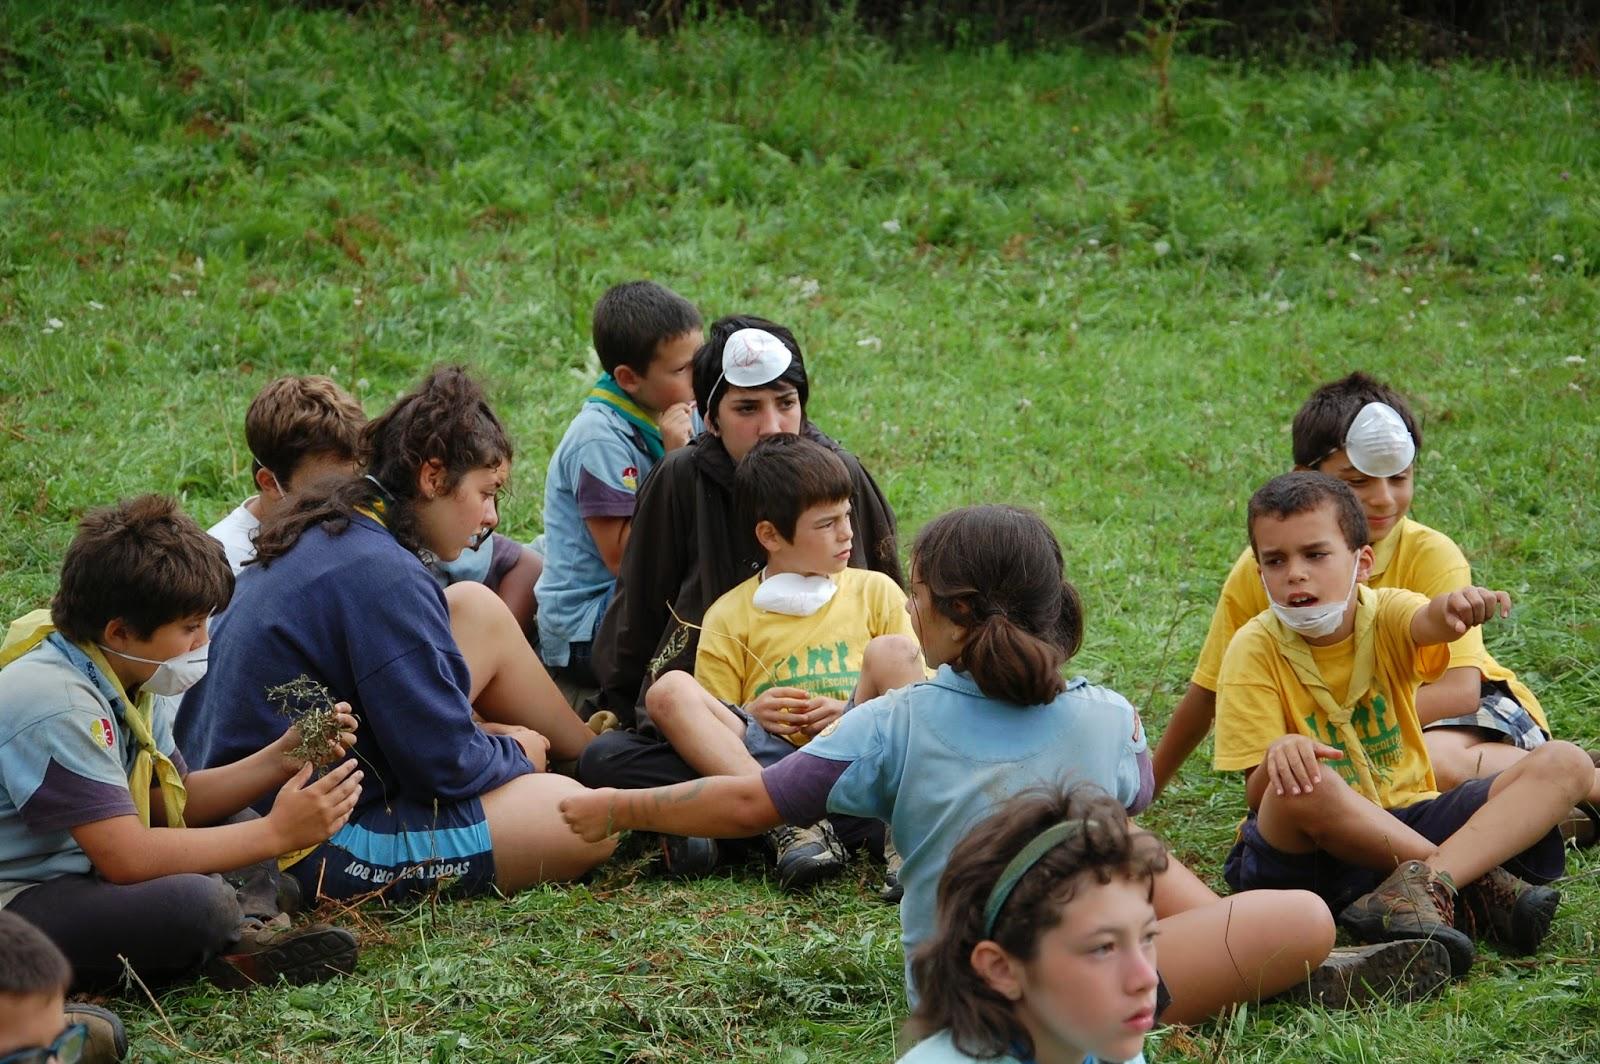 Campaments Estiu RolandKing 2011 - DSC_0236%2B2.JPG